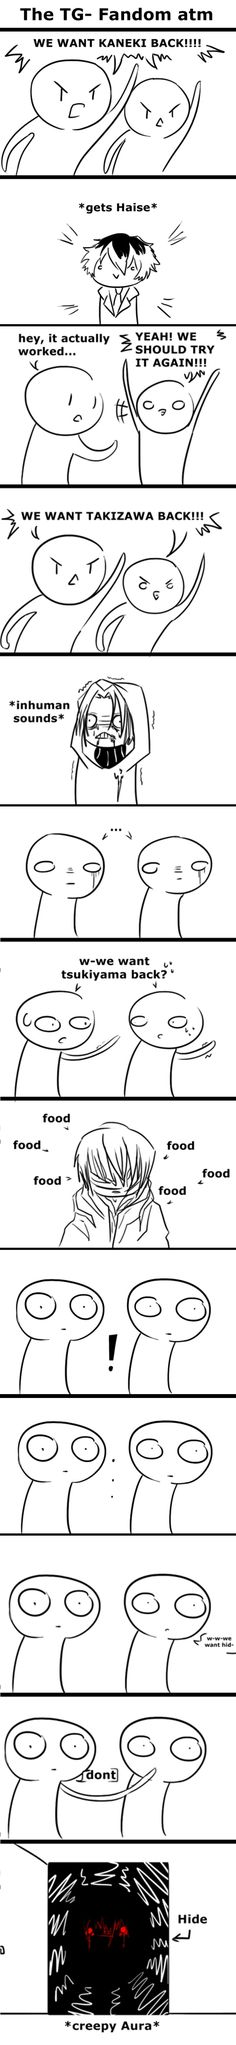 Accurate ||| Tokyo Ghoul Fans, Kaneki, Sasaki, Takizawa, and Hide ||| Tokyo Ghoul: Re Fan Art